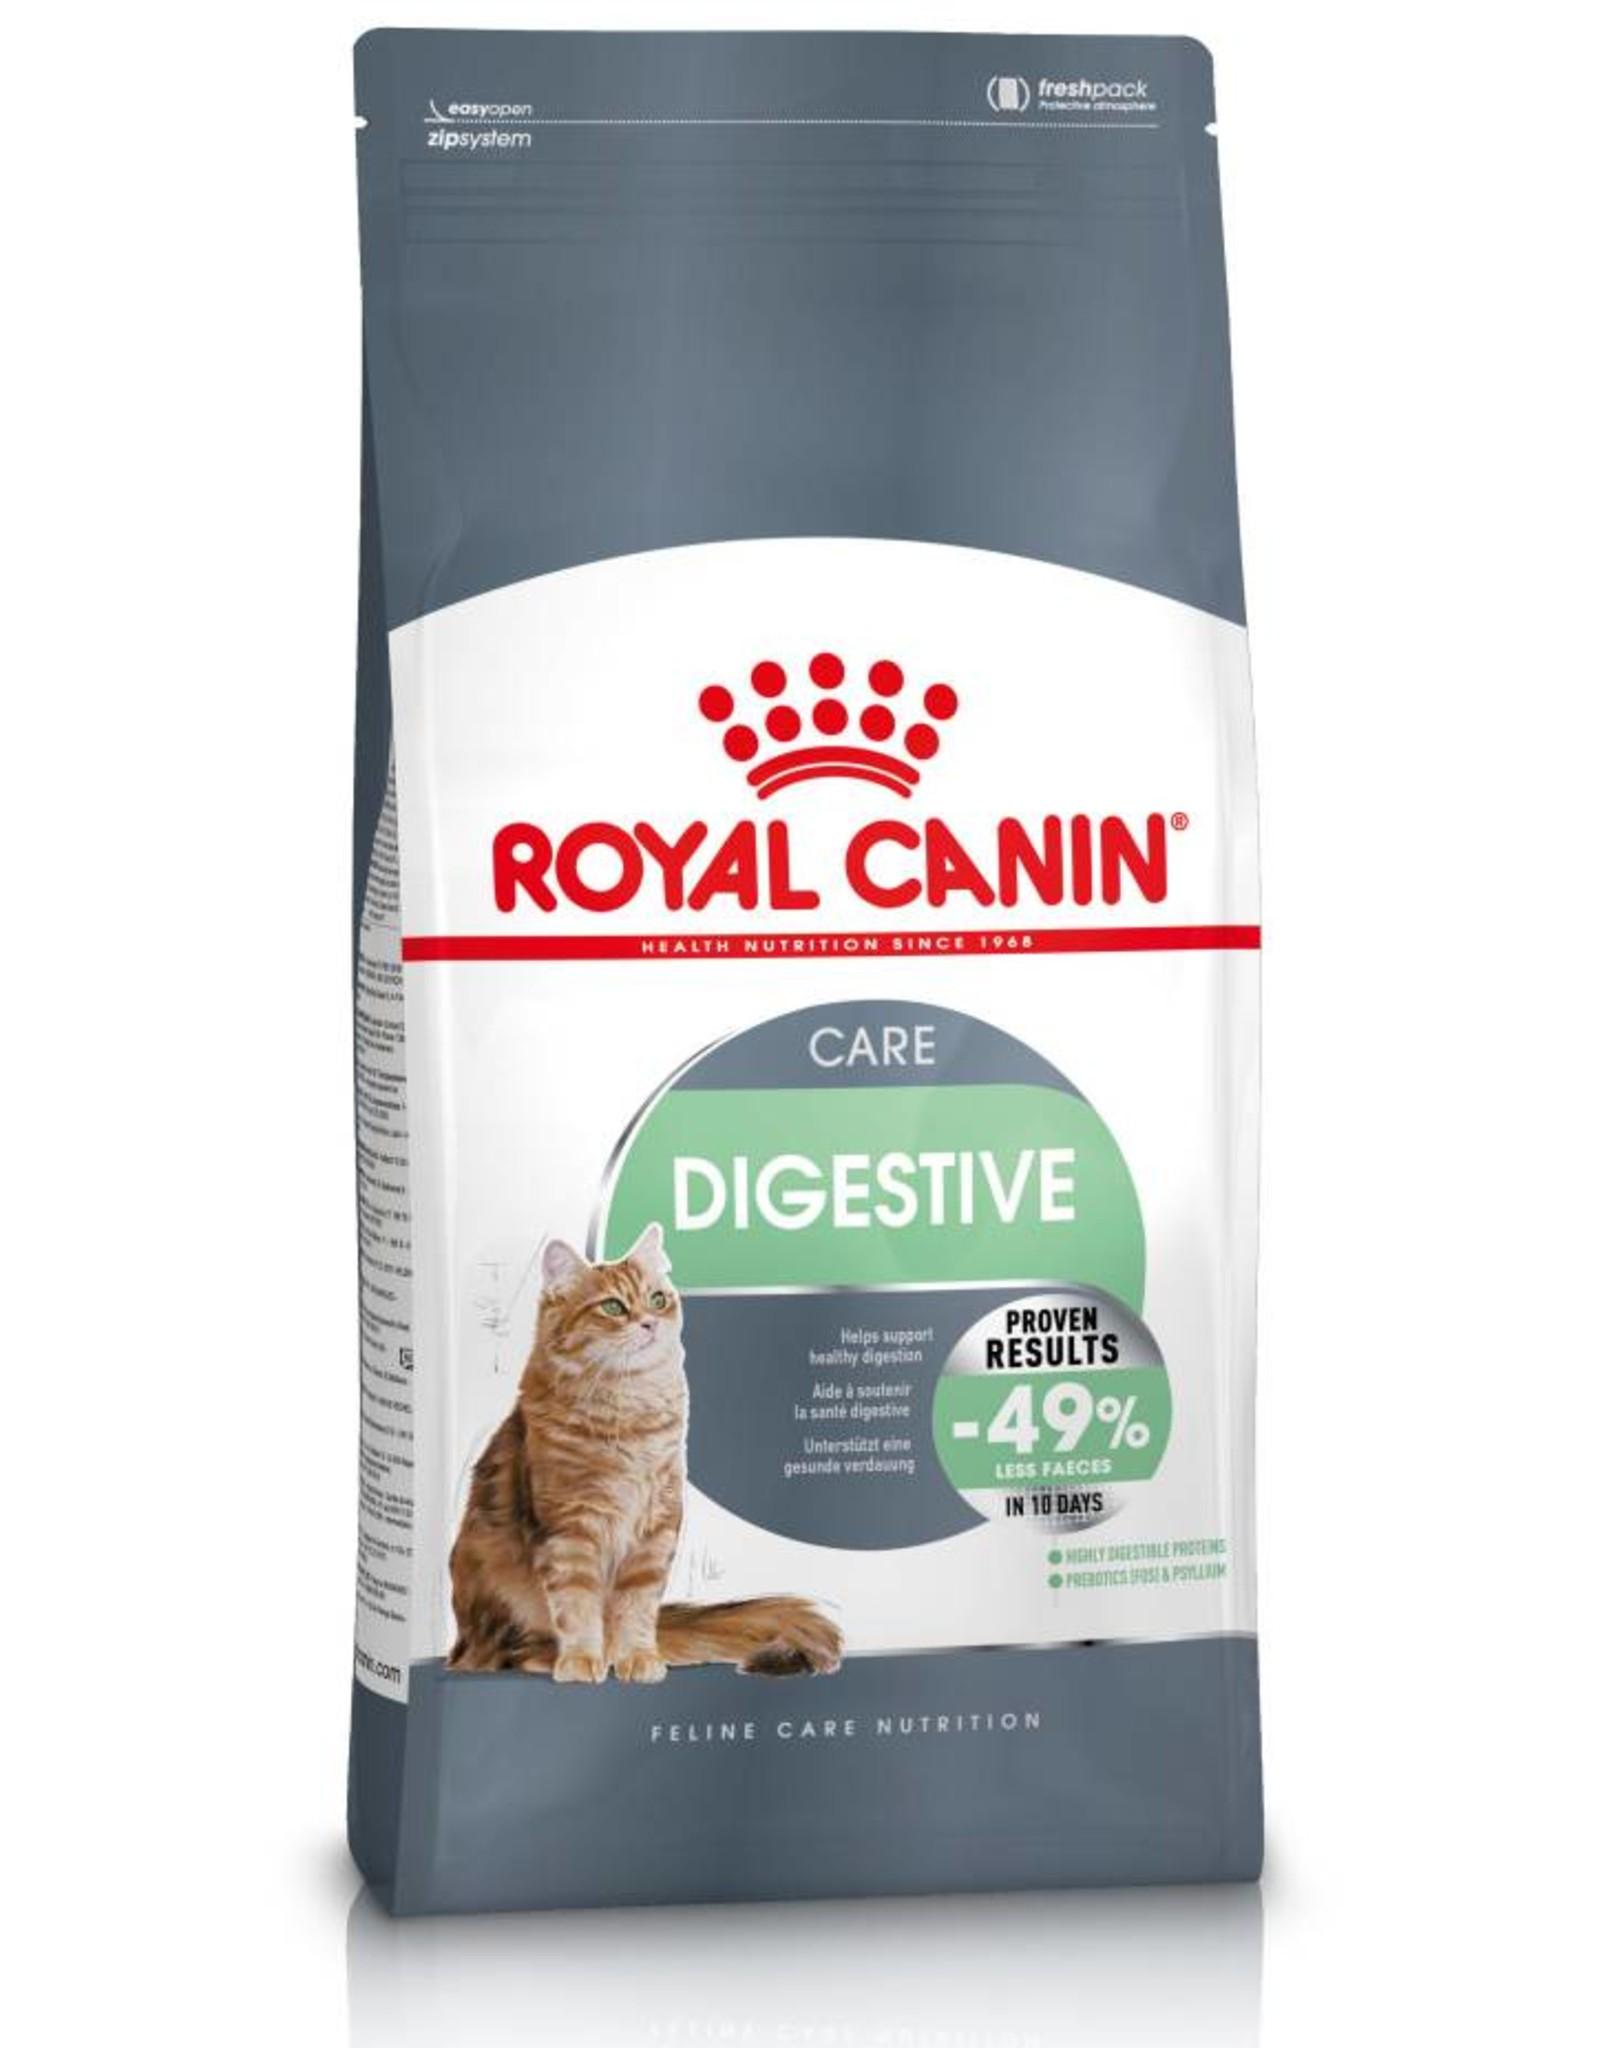 Royal Canin Digestive Care Cat Food